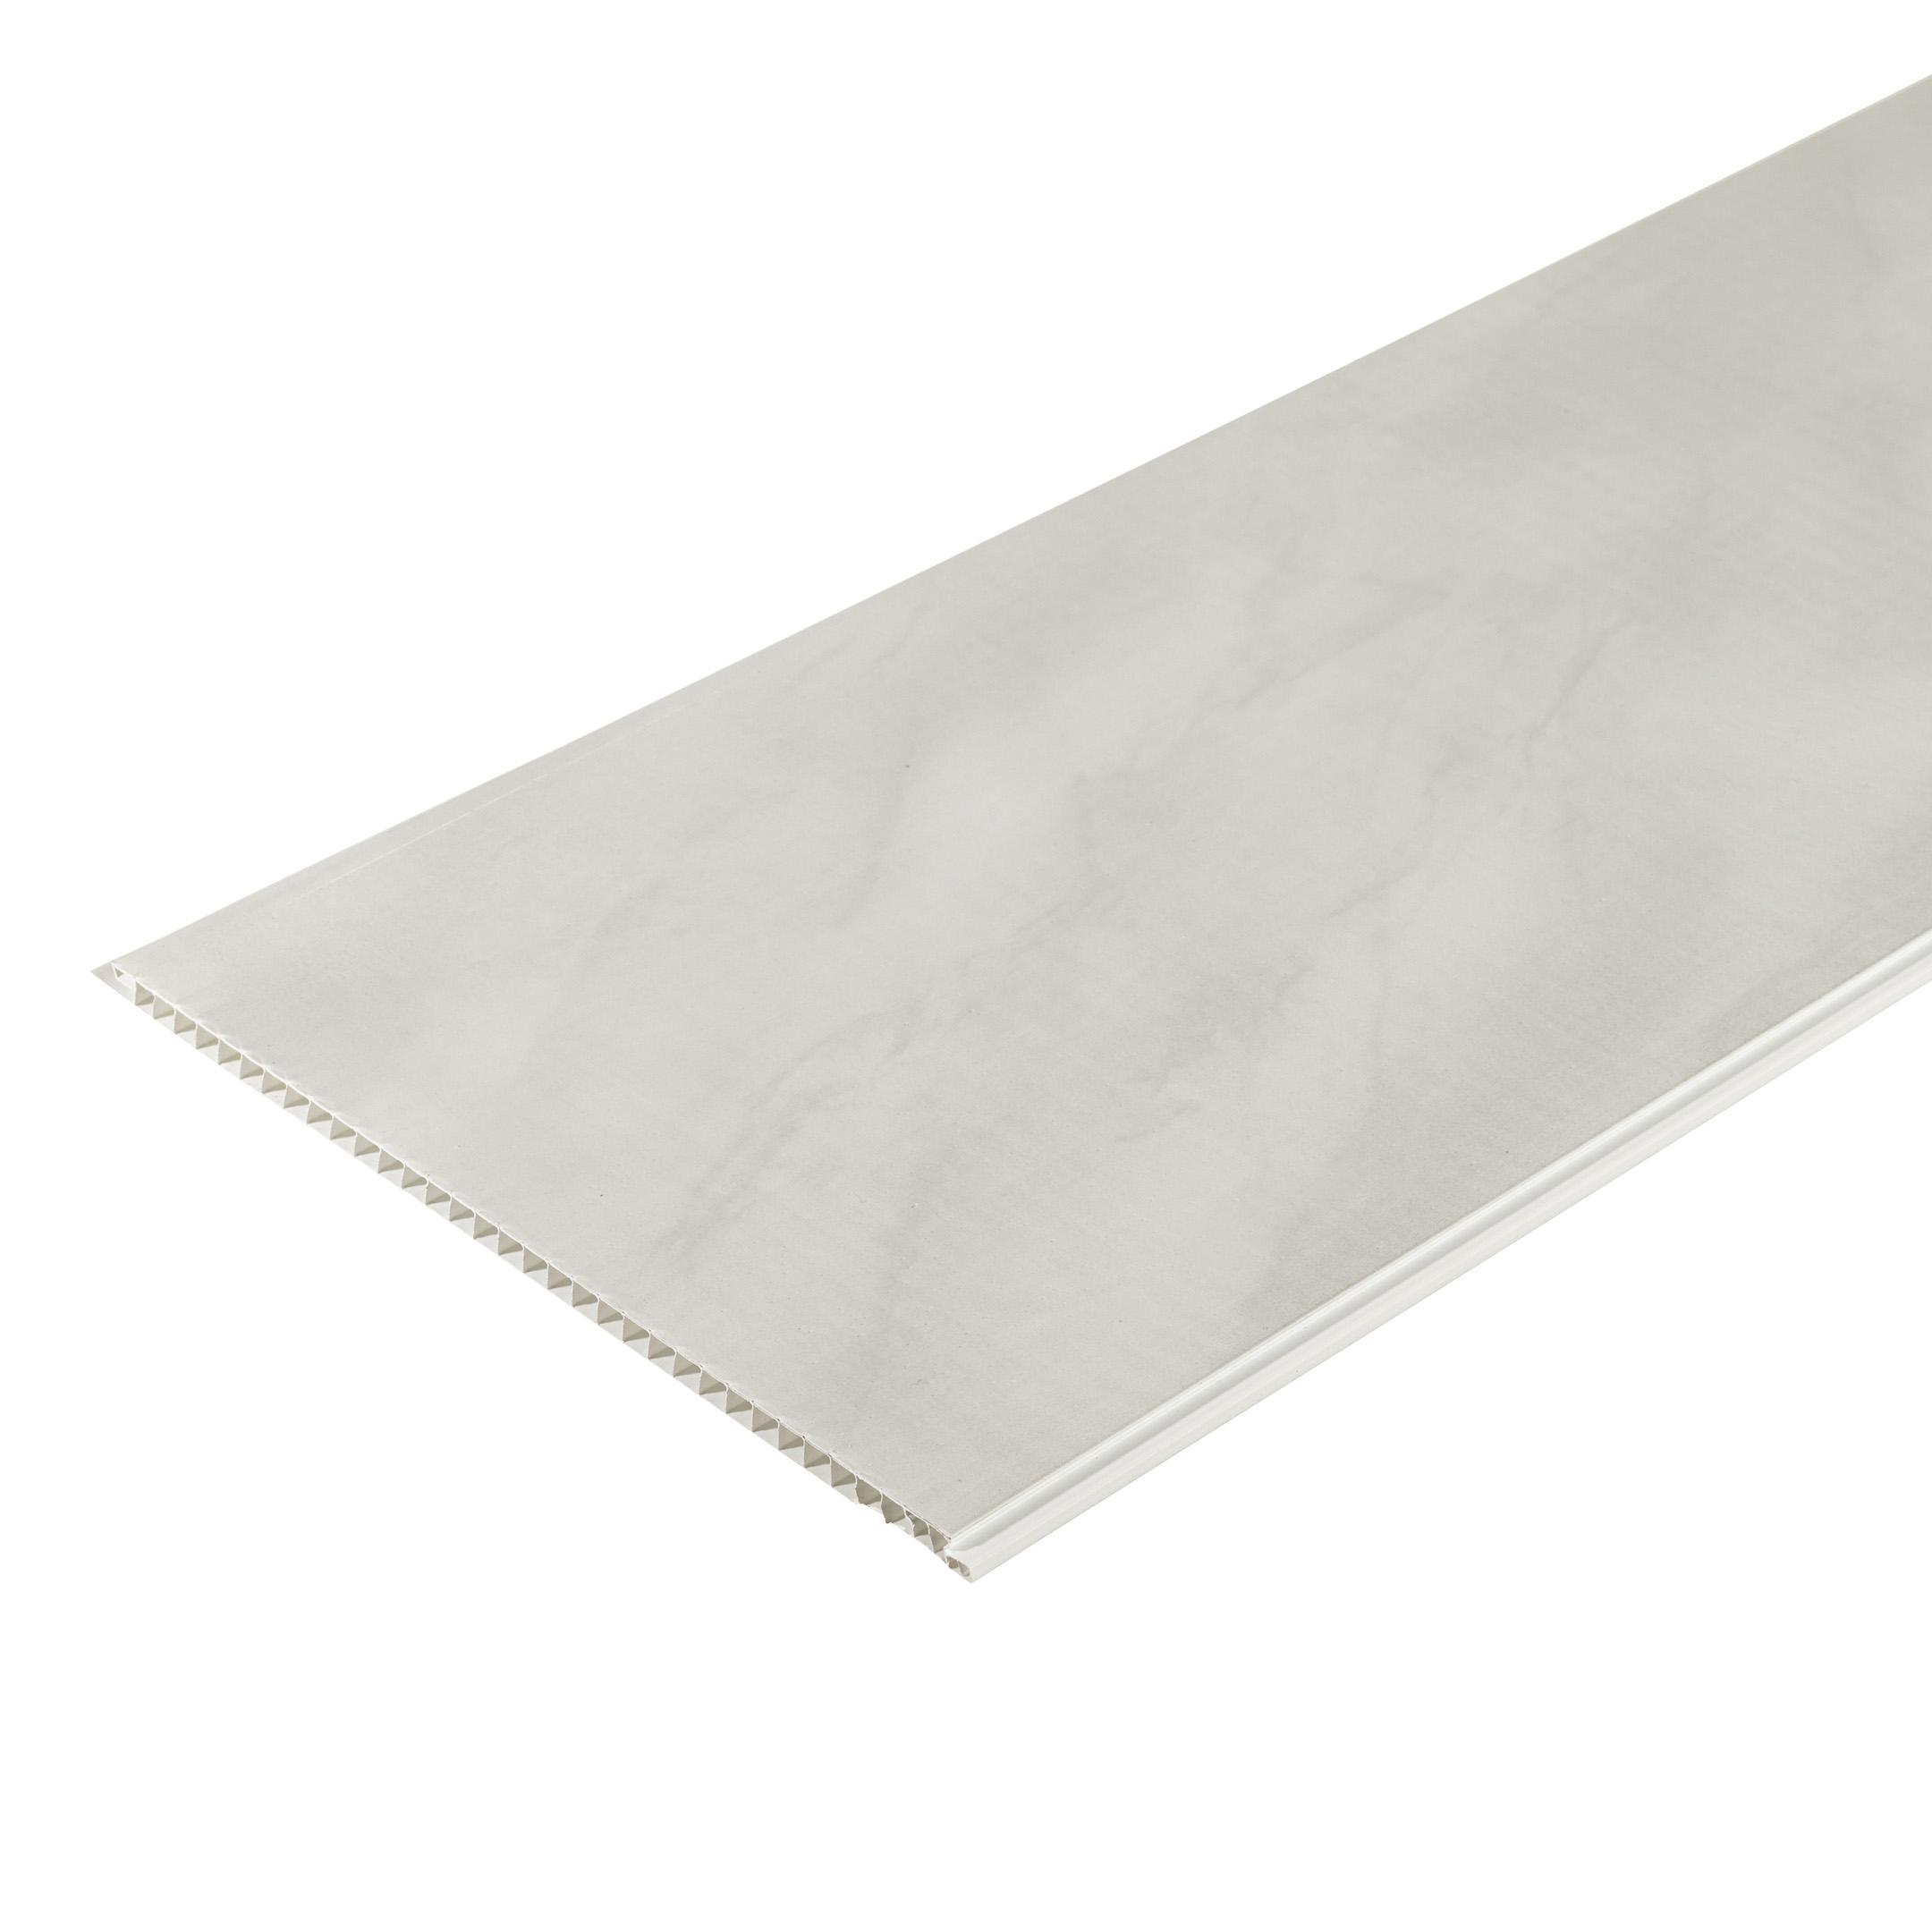 Панель ПВХ 250х2700х8 мм Nordside мрамор светло-серый офсет